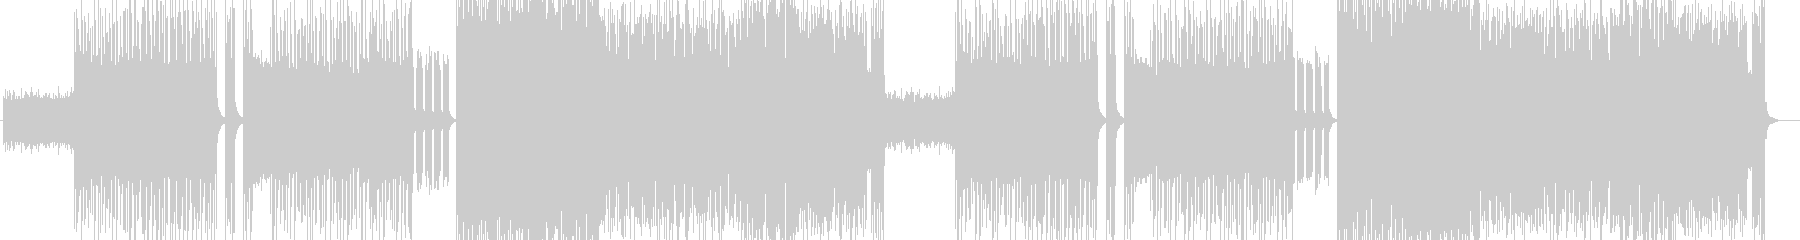 「HR/HM」「DEATH」BGM251の未再生の波形